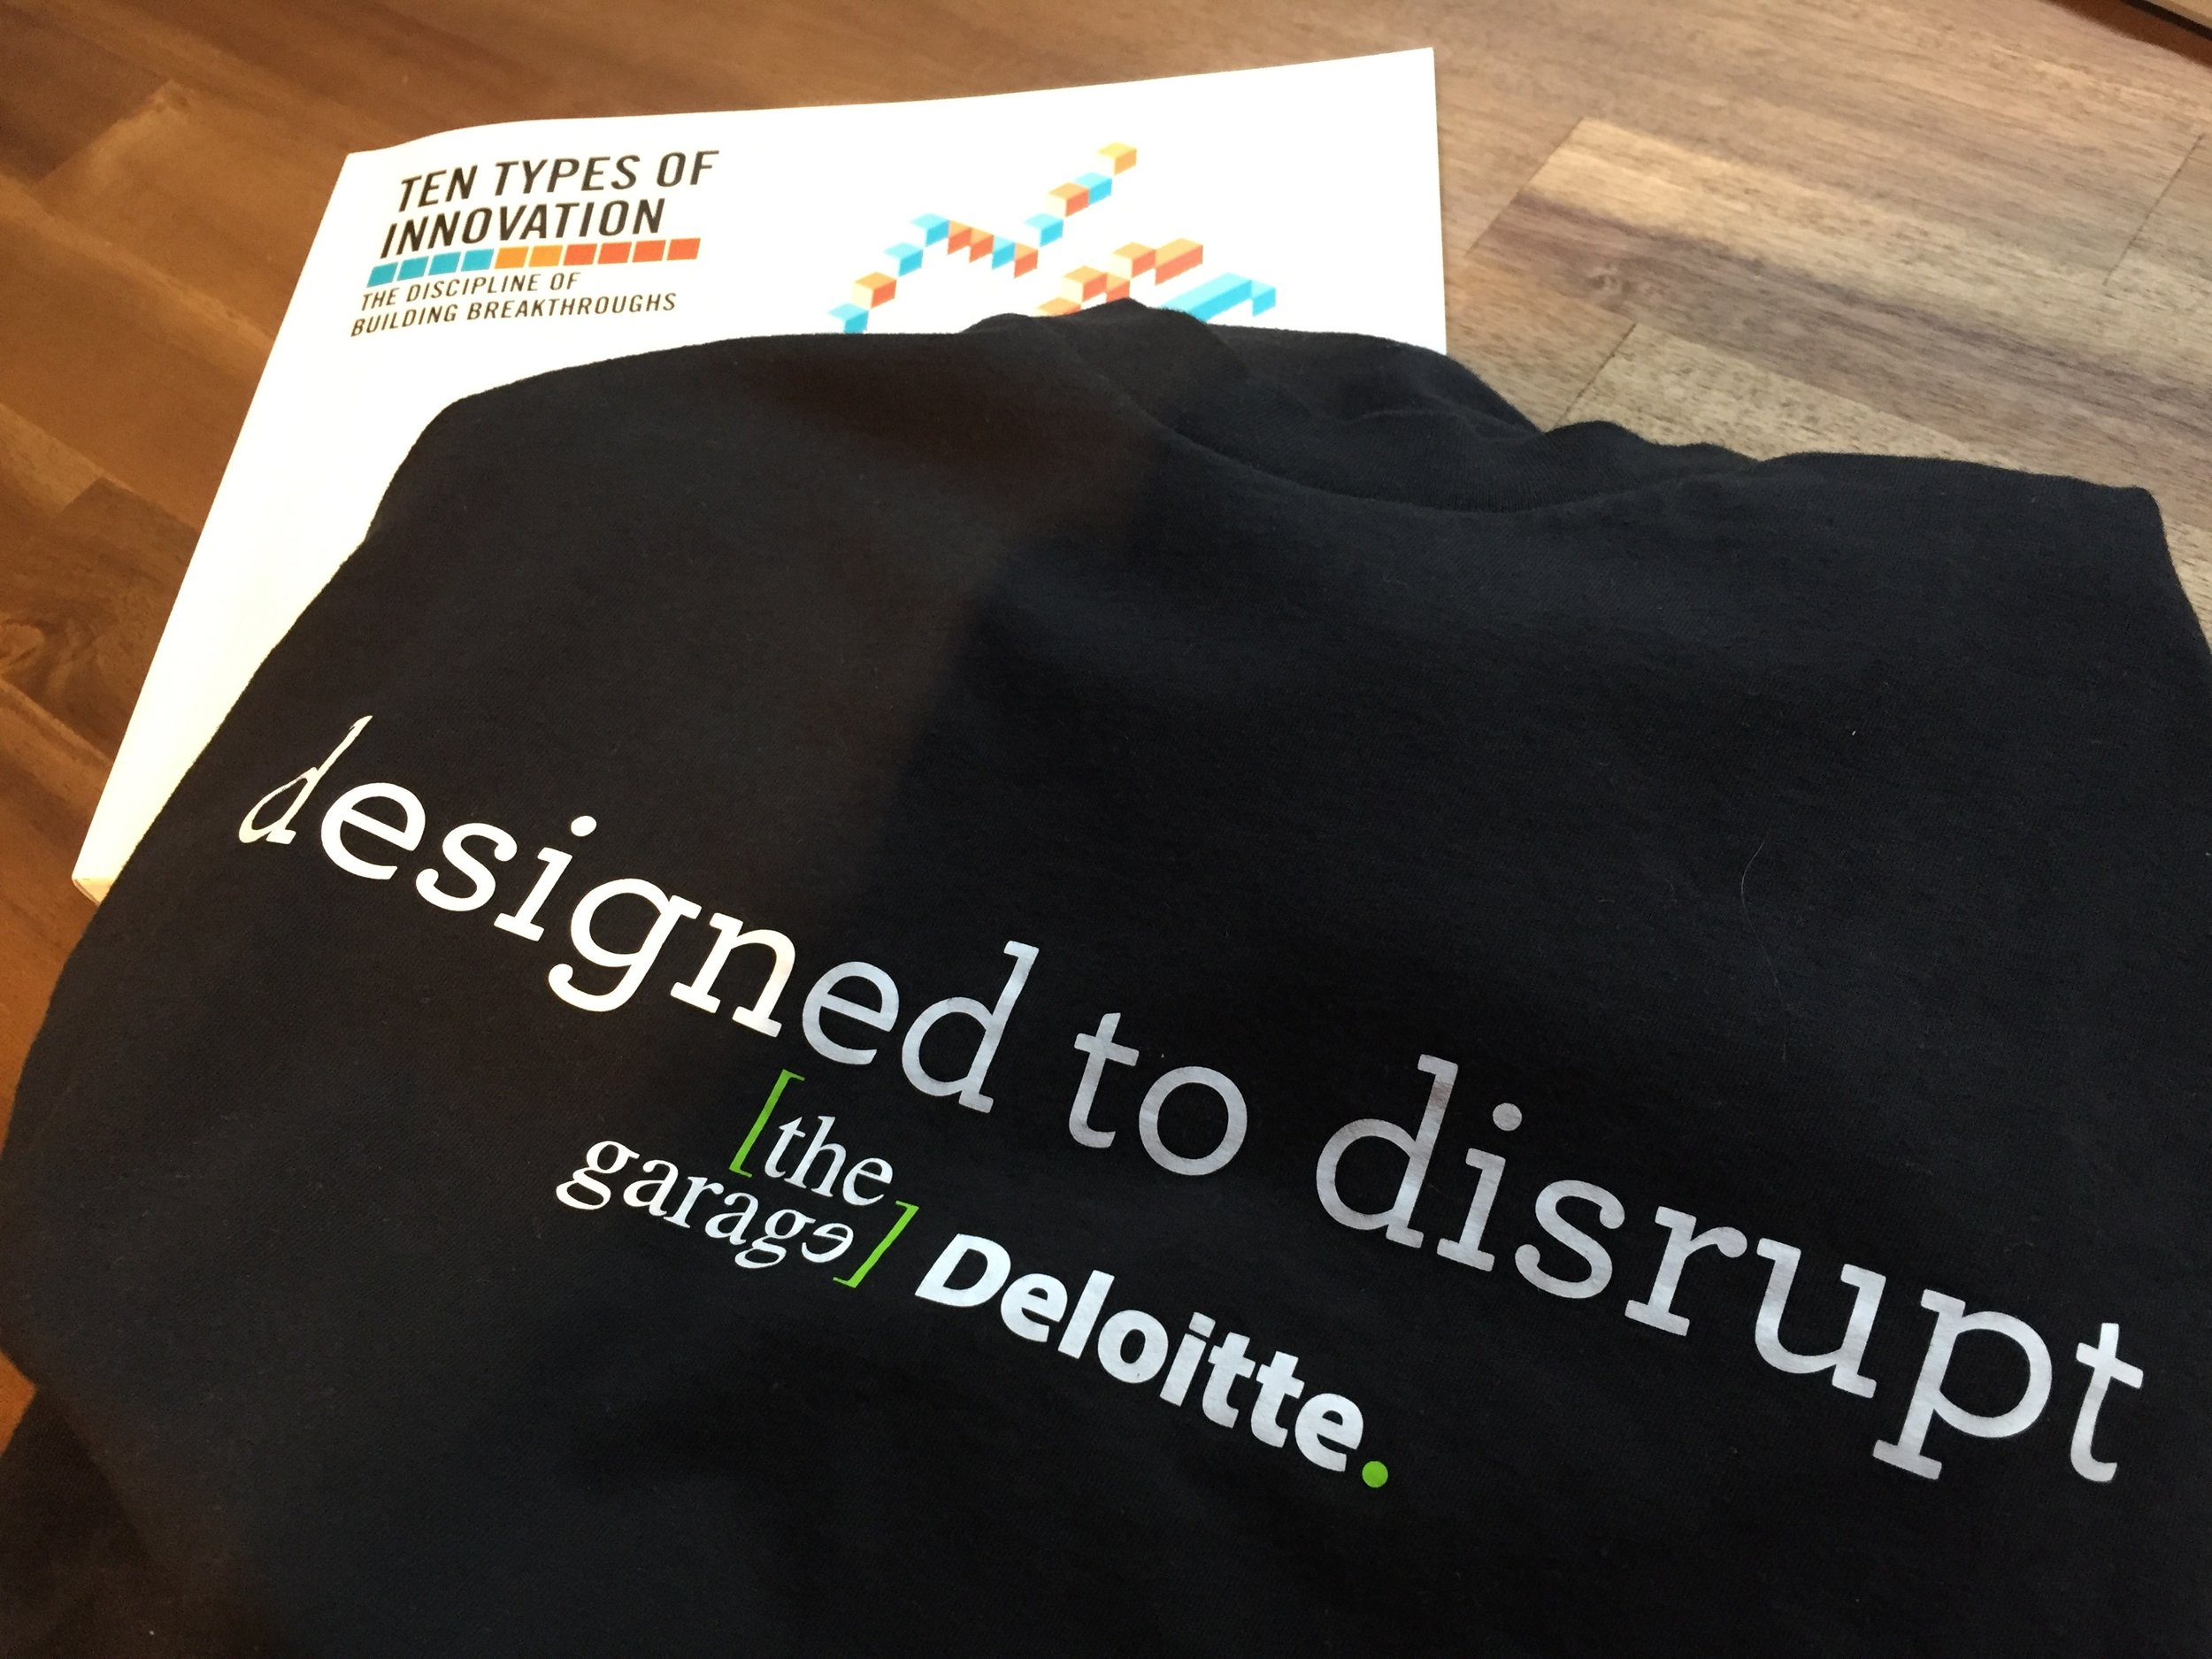 designed_disrupt_deloitte.jpg